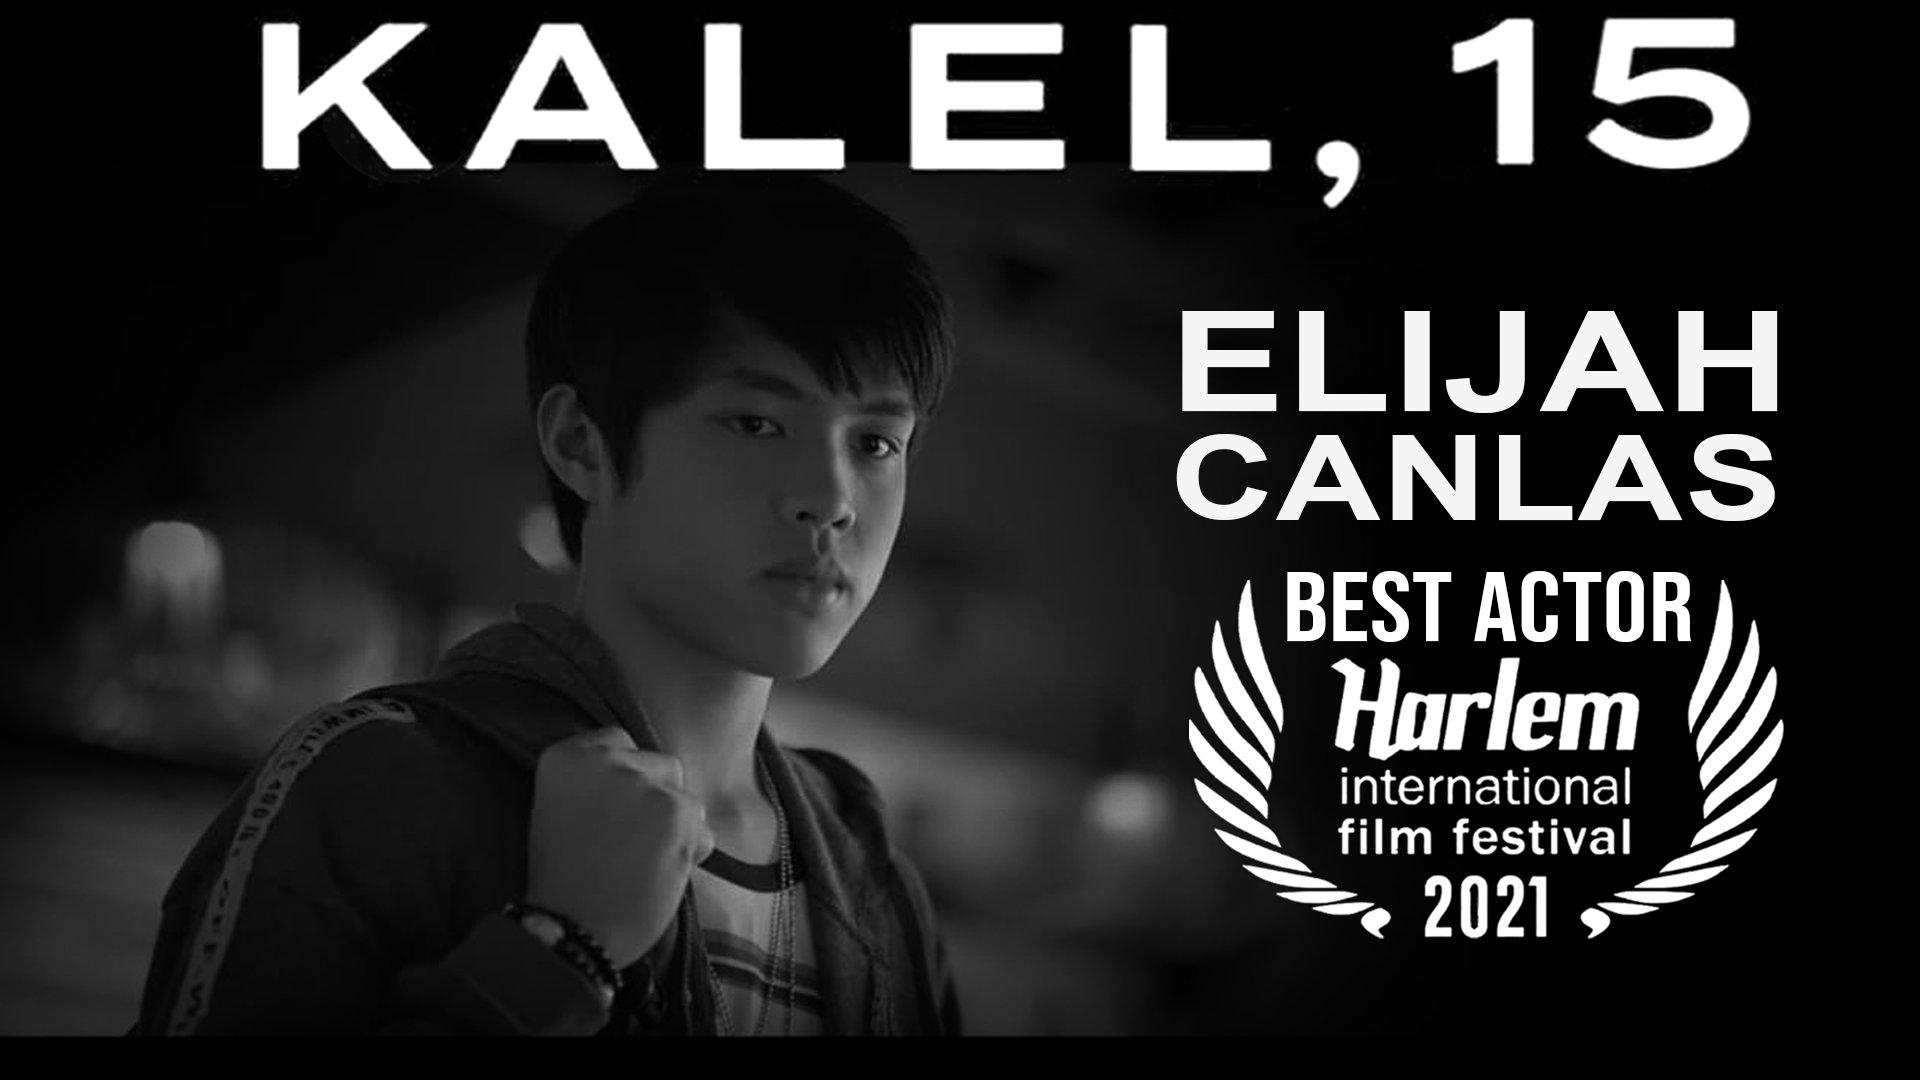 Elijah Canlas Best Actor Harlem International Film Festival